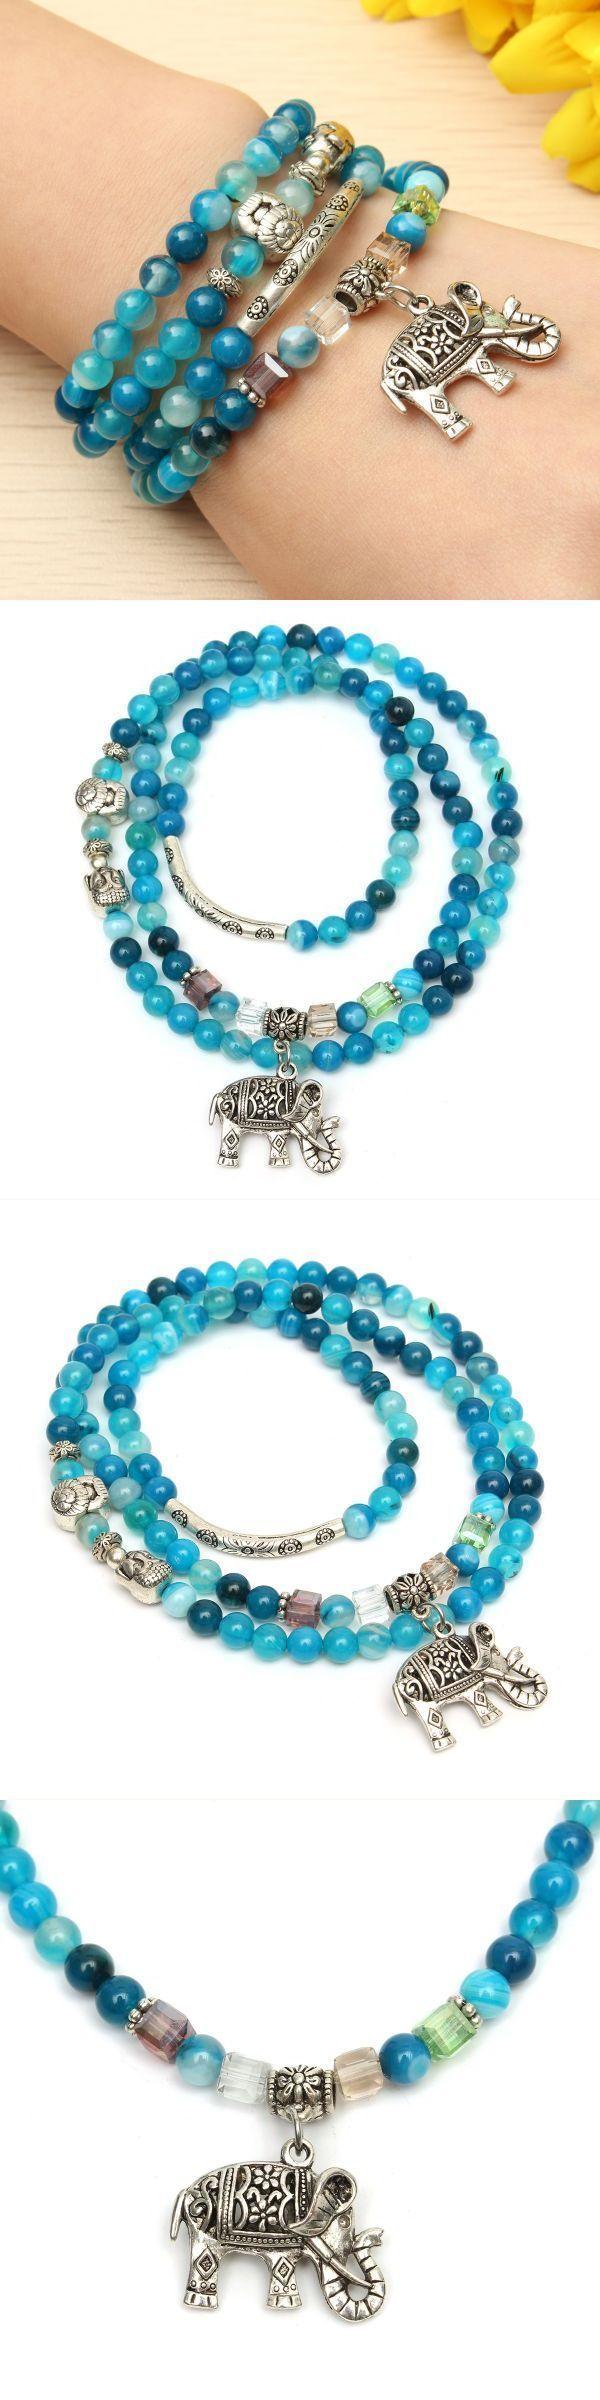 Natural agate crystal vintage multi-layer blue tourmaline buddha head bracelets bracelets gift boxes #bracelets #jewelry #bracelets #nepal #bracelets #with #meaning #gear #s #bracelets